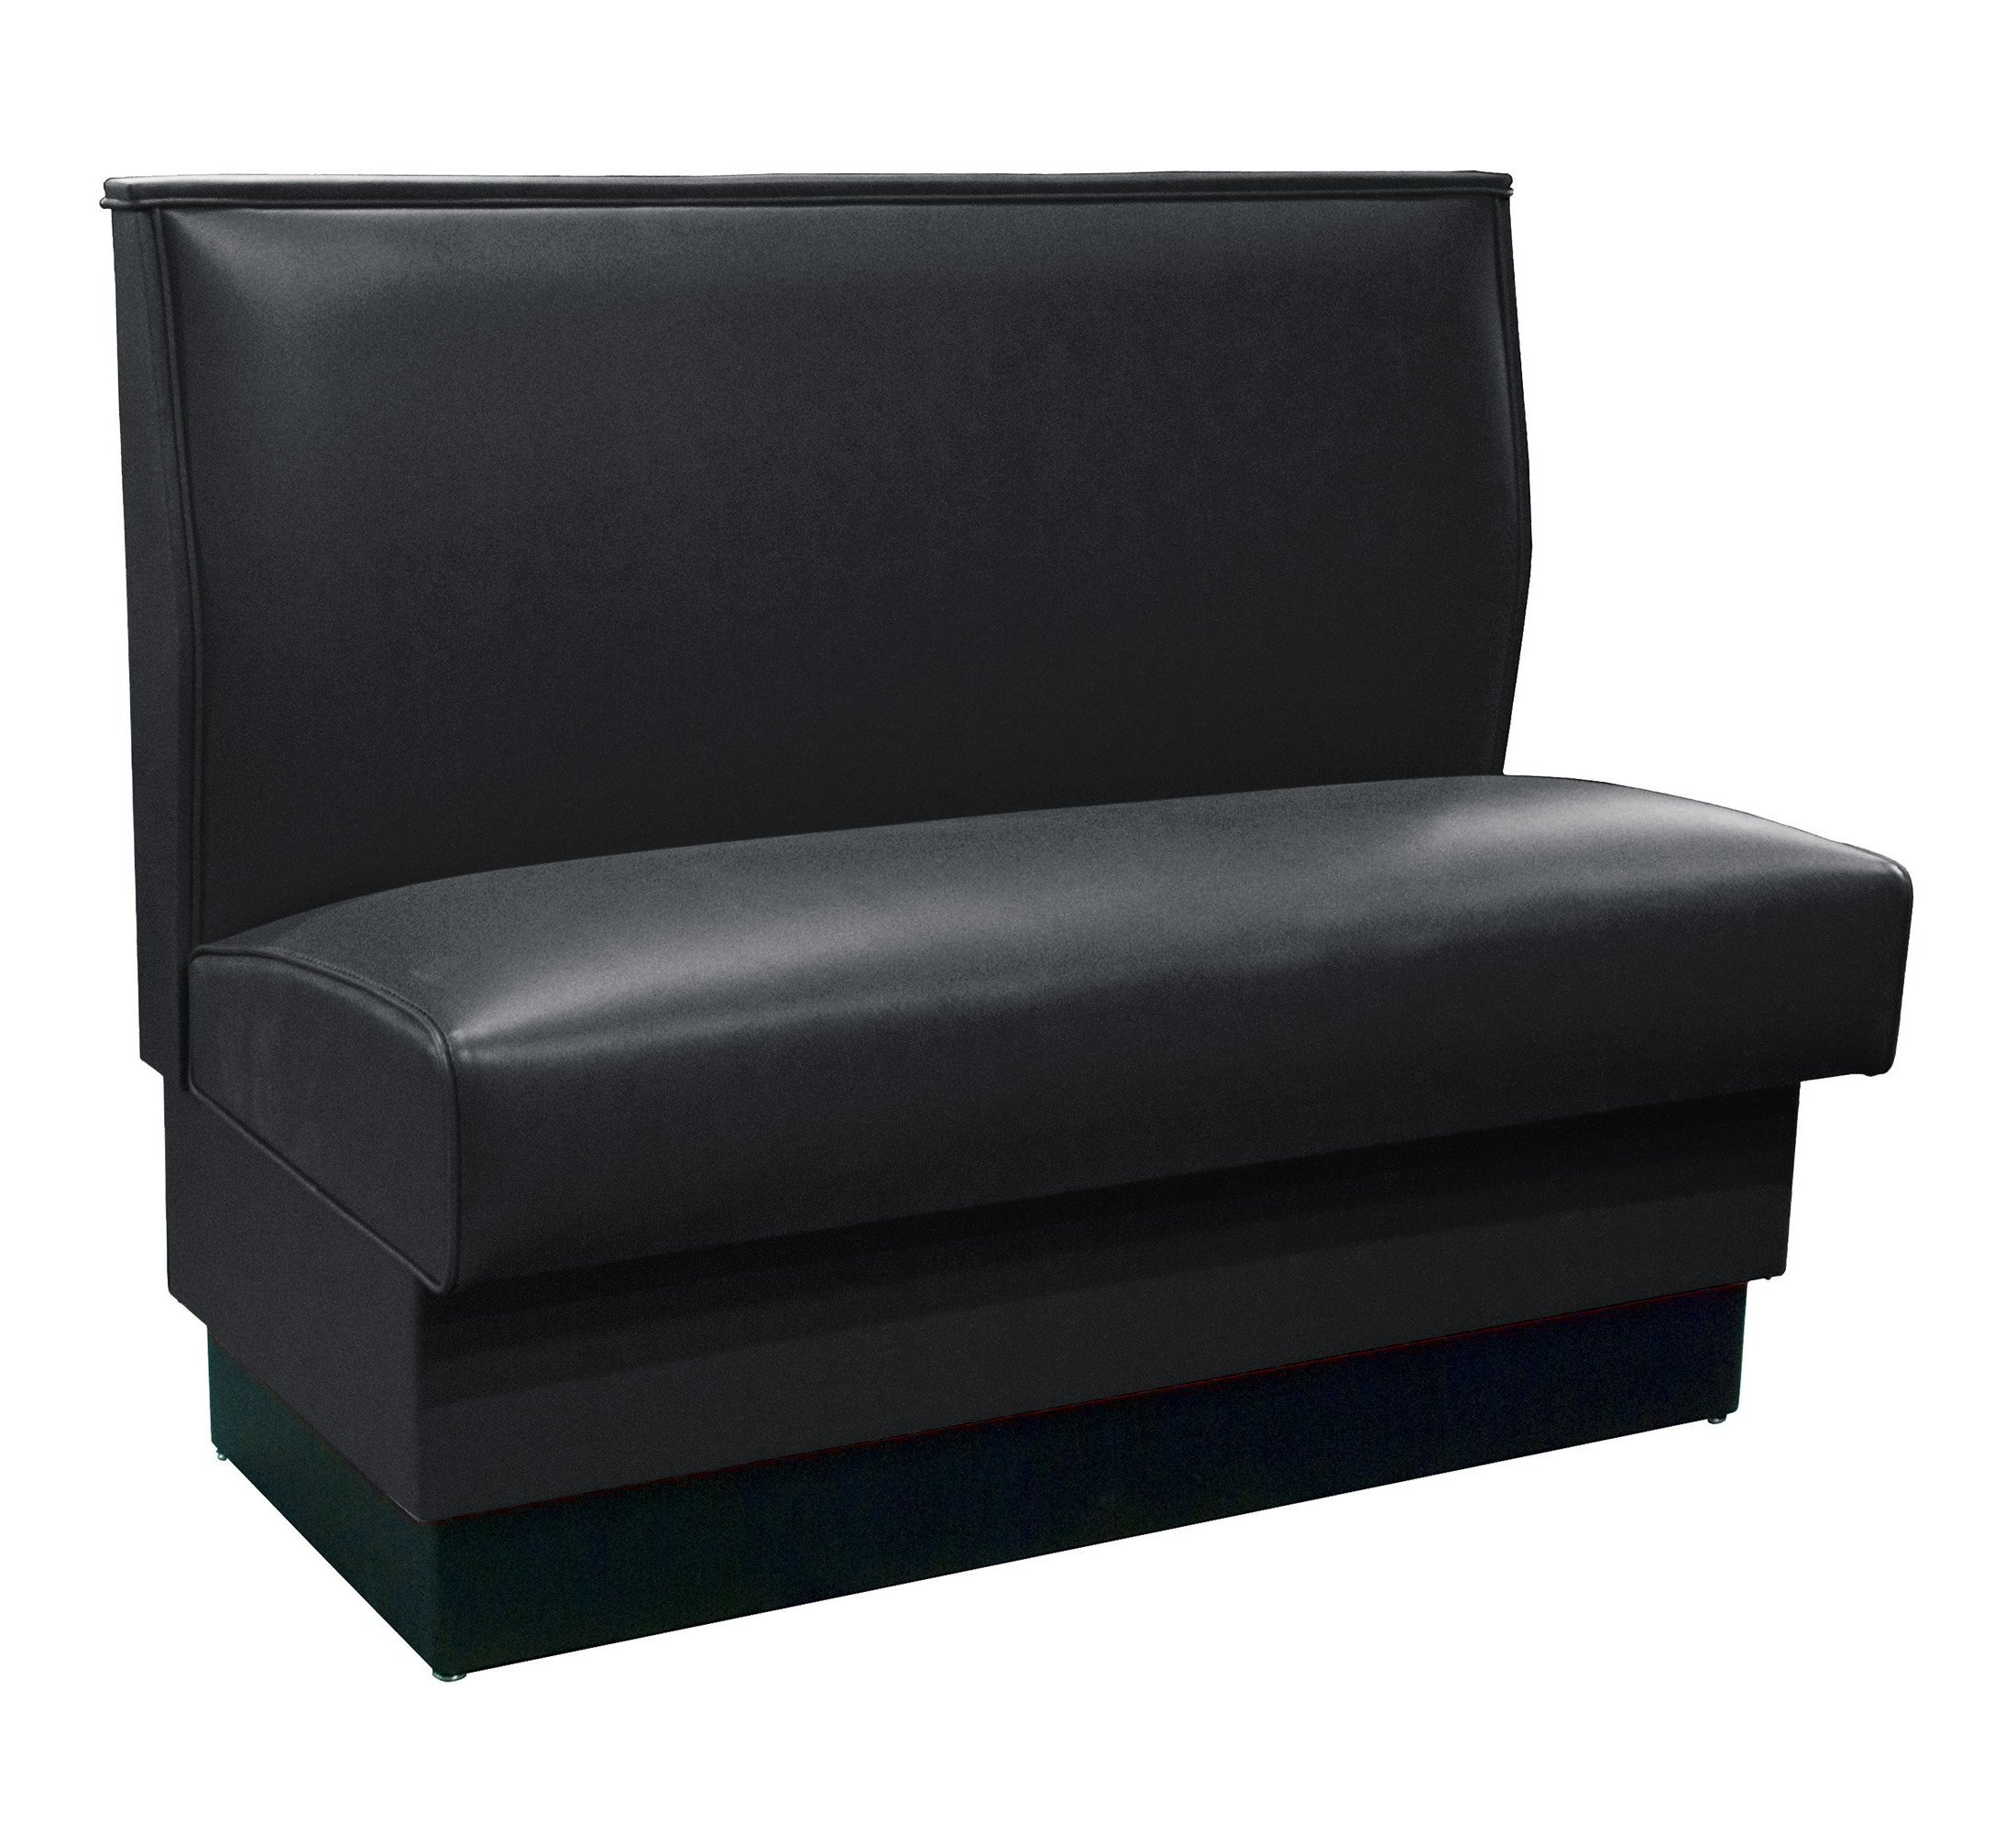 American Tables & Seating QAS-36-Tsunami-ARM-126-M Plain Back Upholstered Booths, Single, 36'' Height, Black